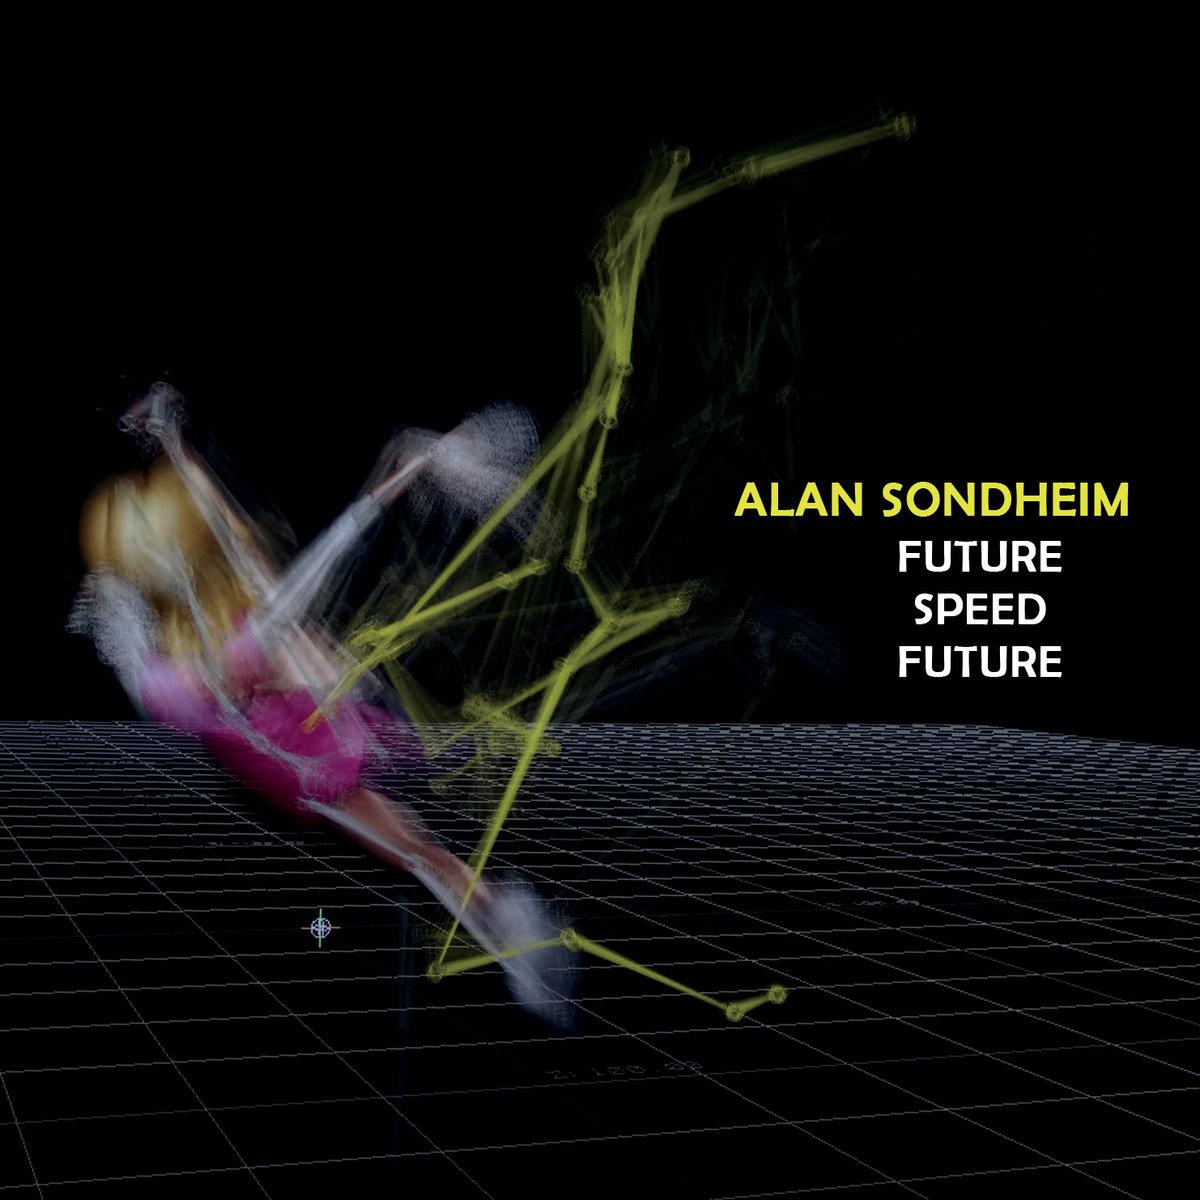 Alan Sondheim – Future Speed Future (2019) [FLAC]